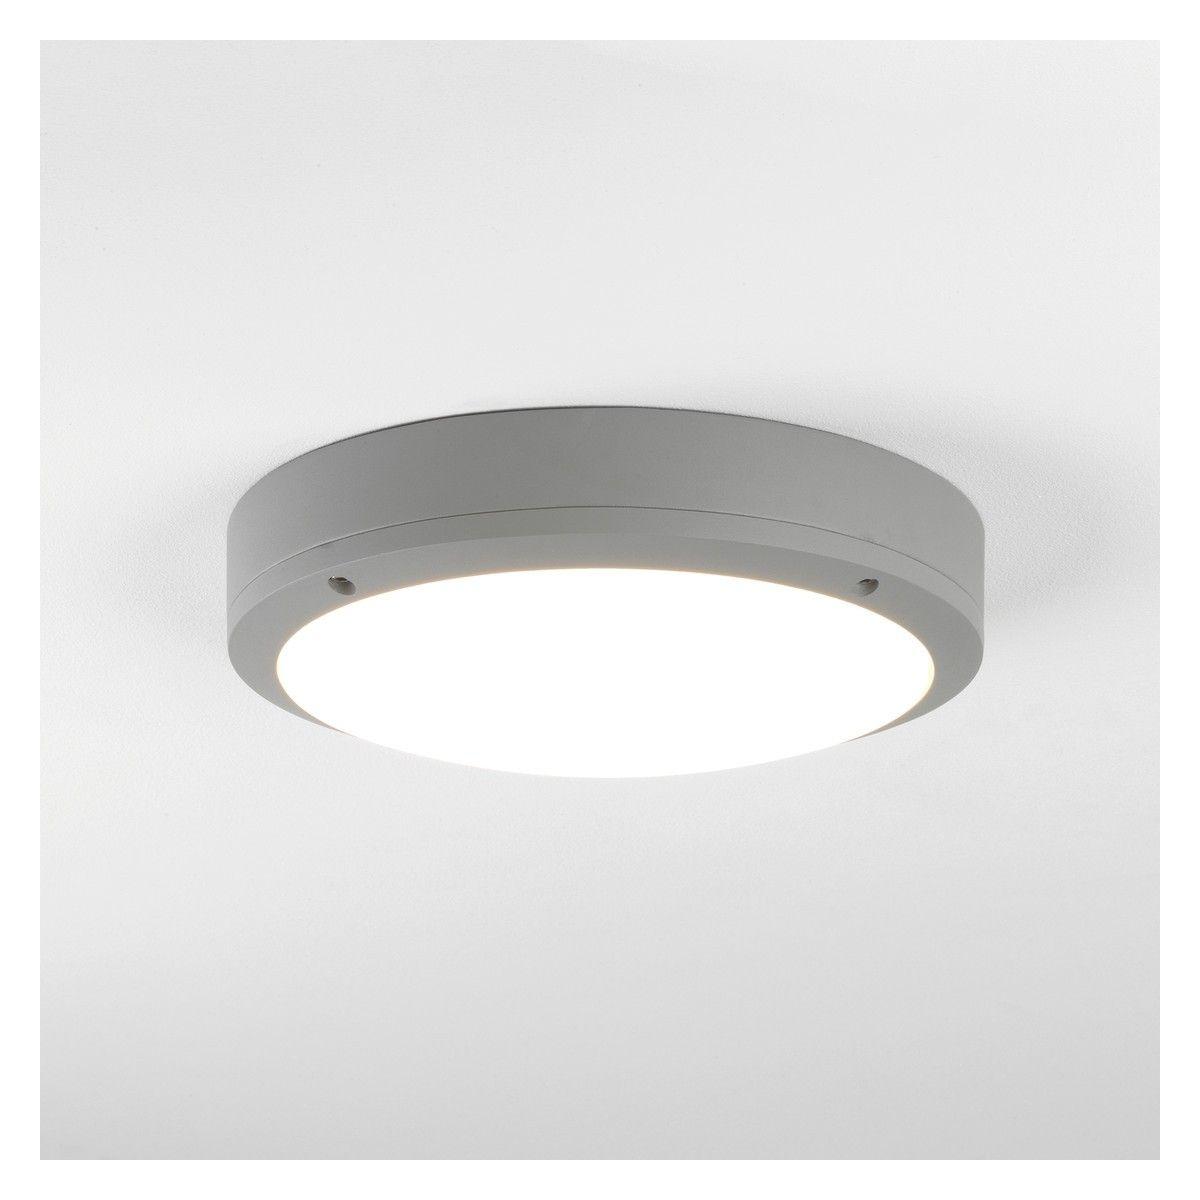 Arta arta silver metal and glass outdoor wall light ip54